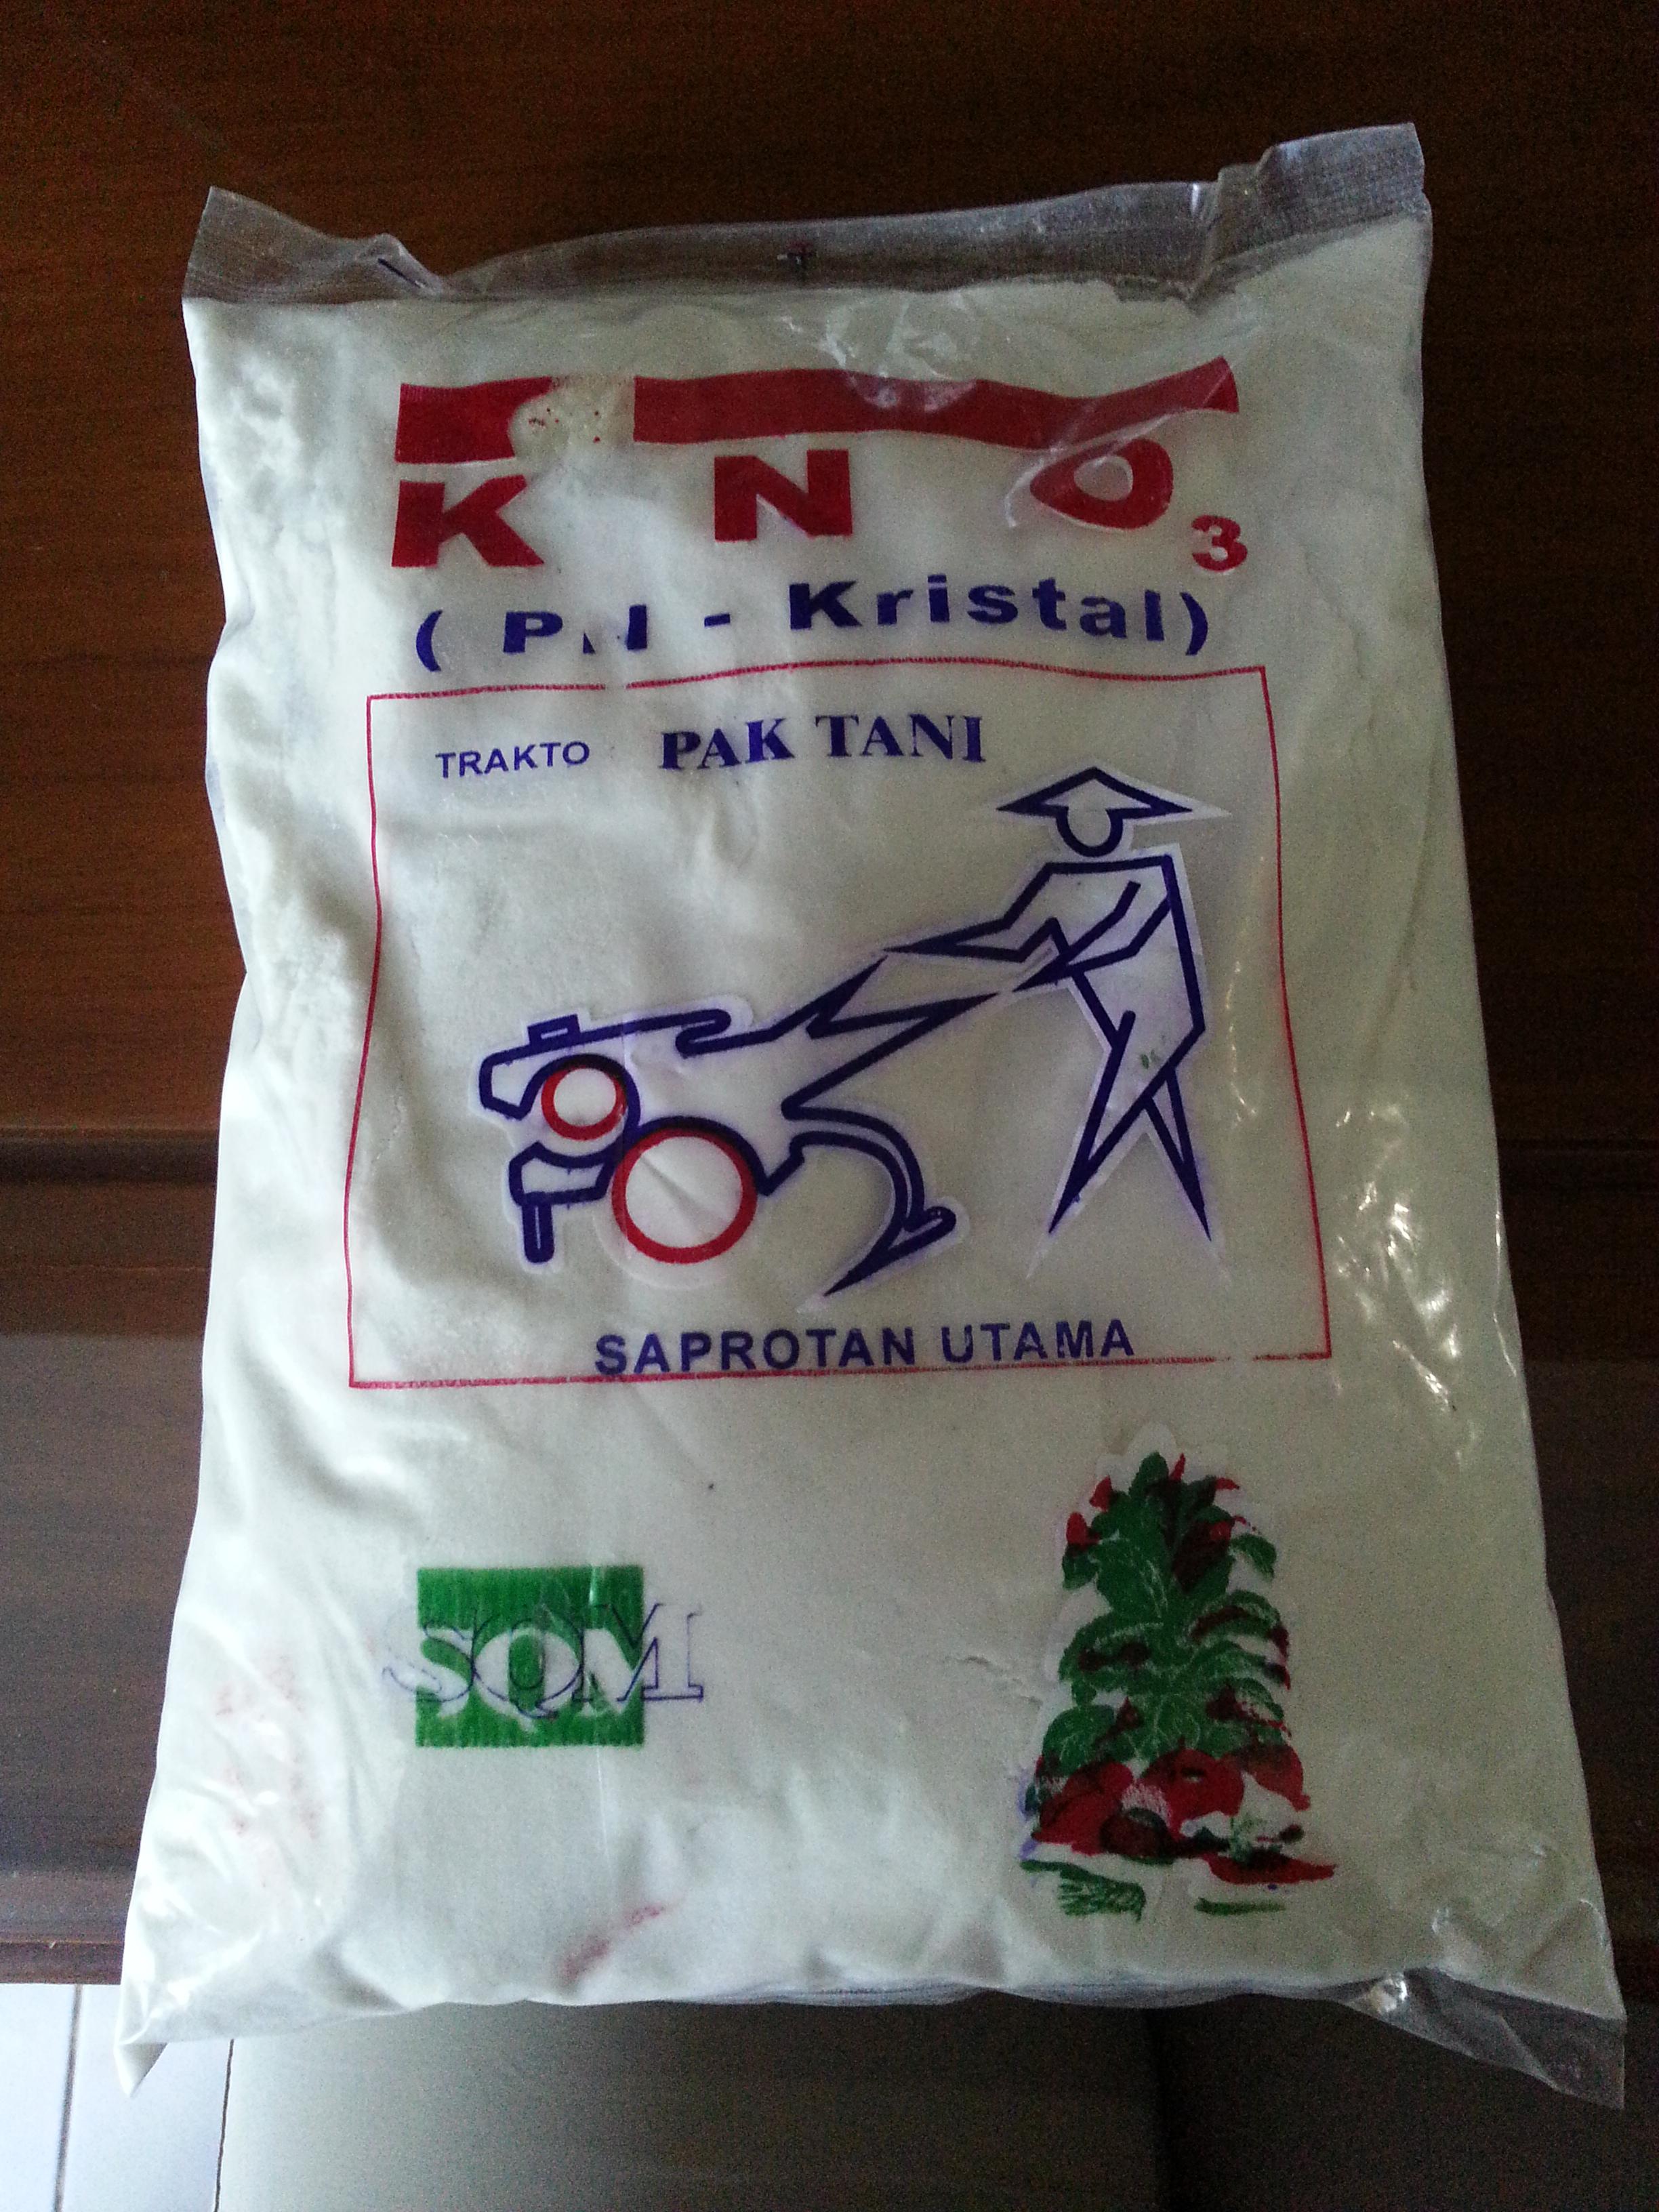 Jual Pupuk Kno3 Potassium Nitrat Murah Bisakimia